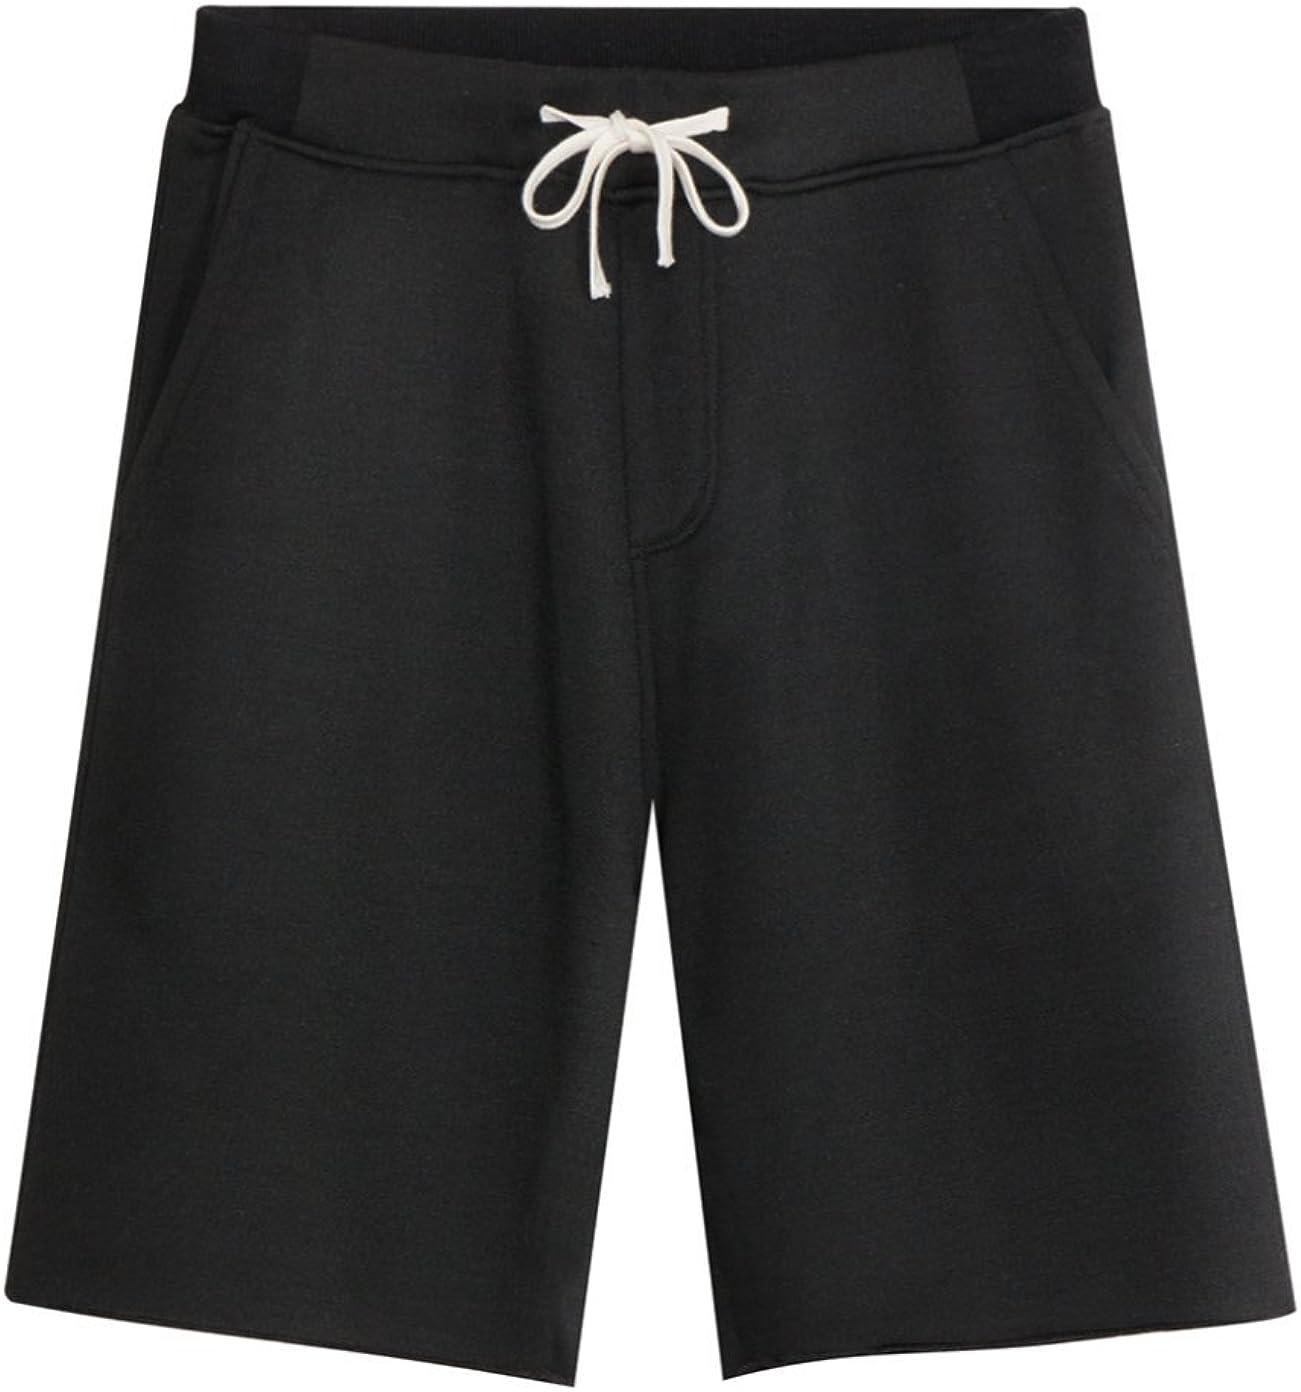 KEYBUR Men's Casual Classic Fit Cotton Elastic Jogger Gym Lightweight Comfort Shorts